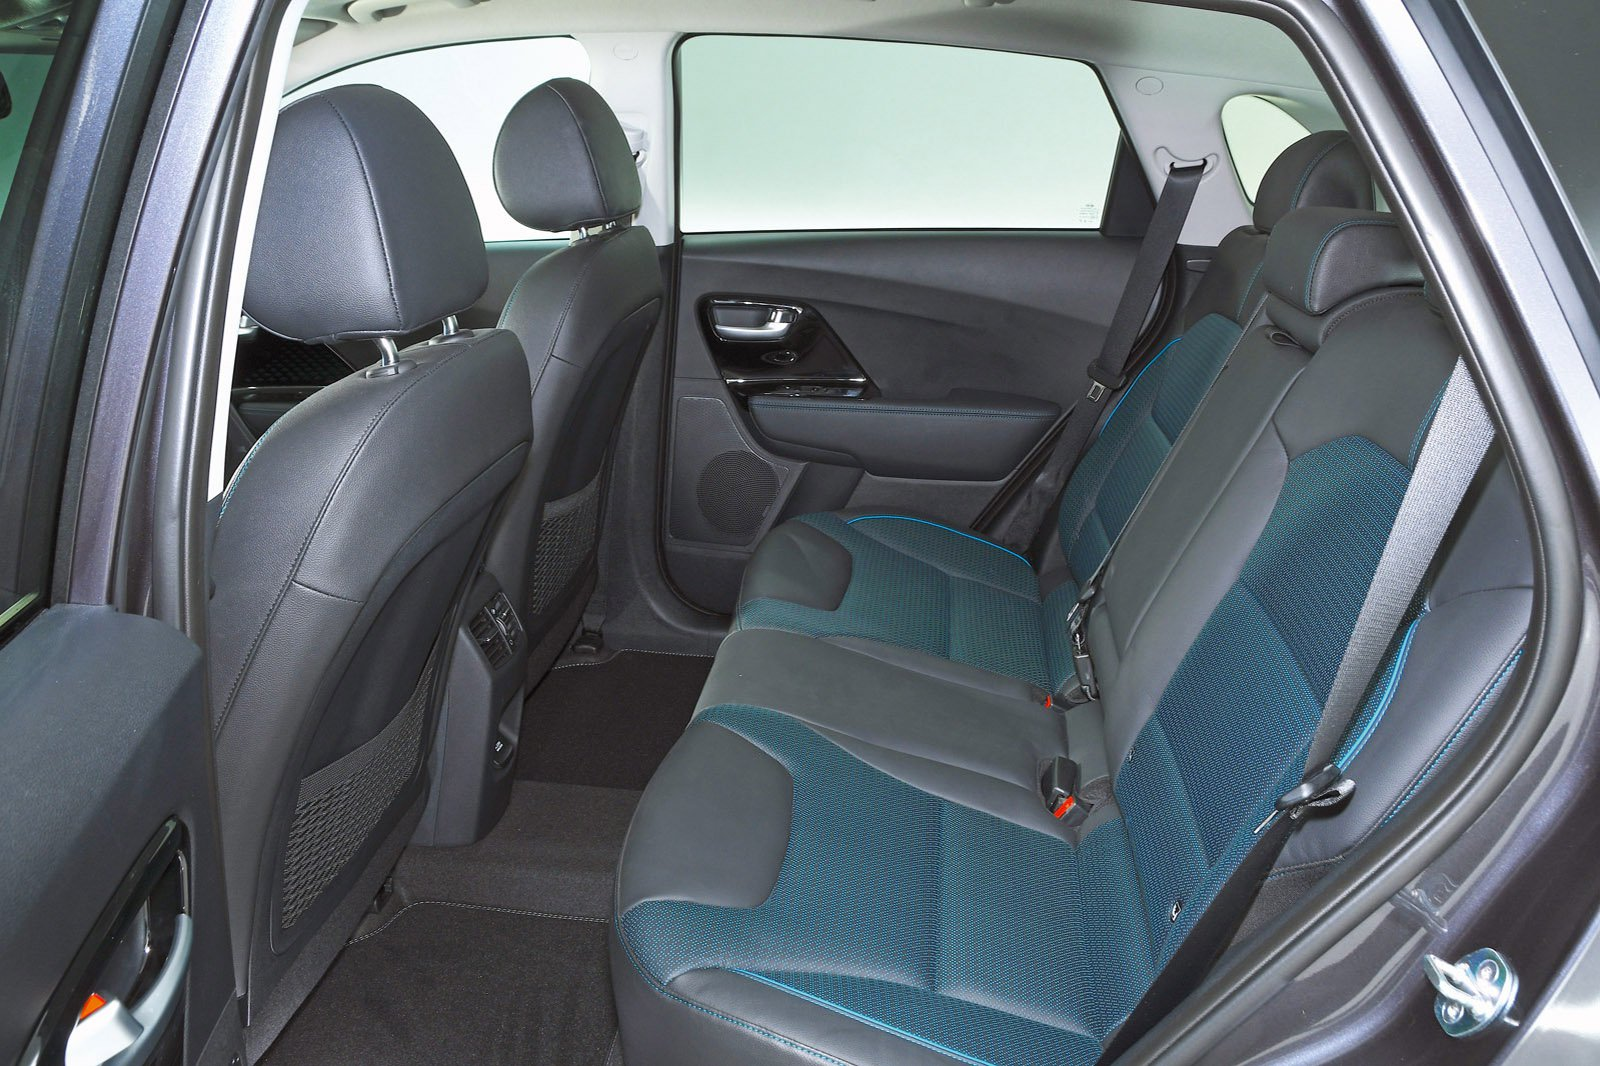 Kia e-Niro back seats